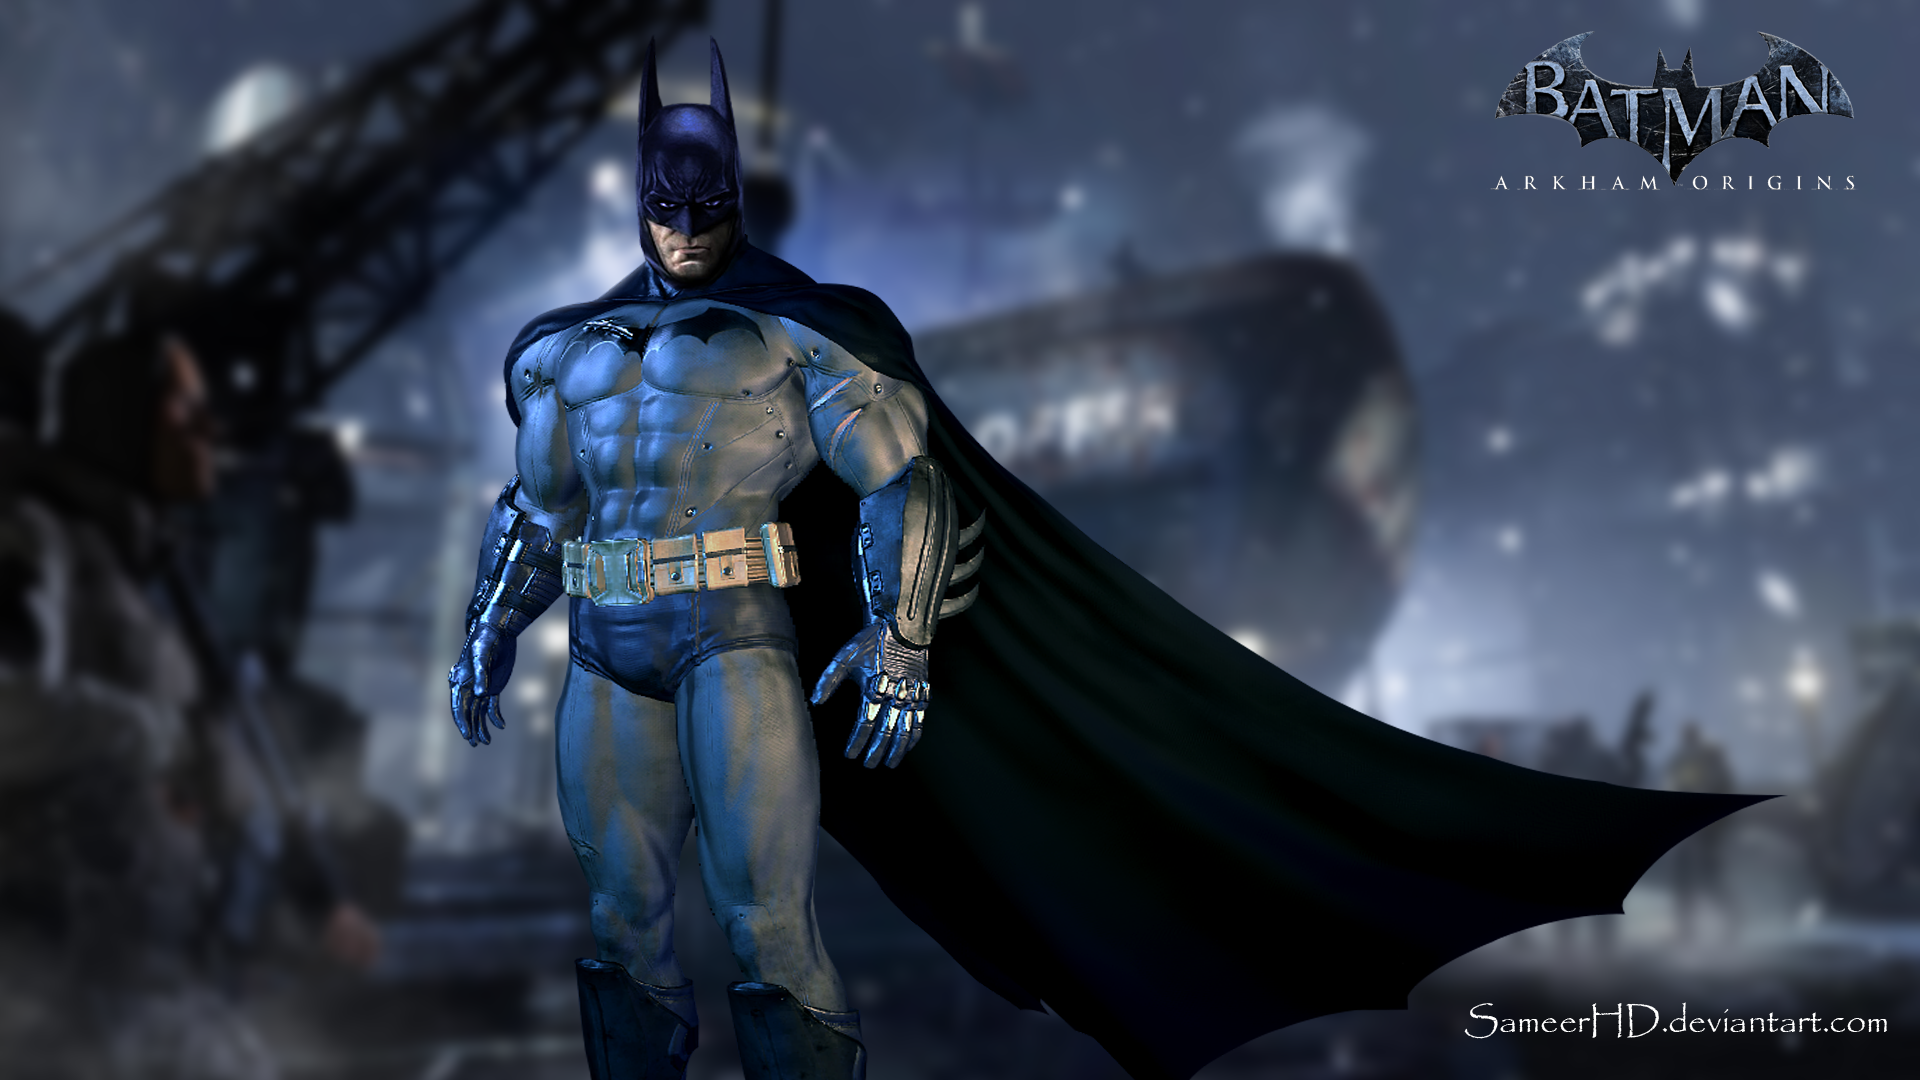 Batman Arkham Origins Wallpaper By SameerHD